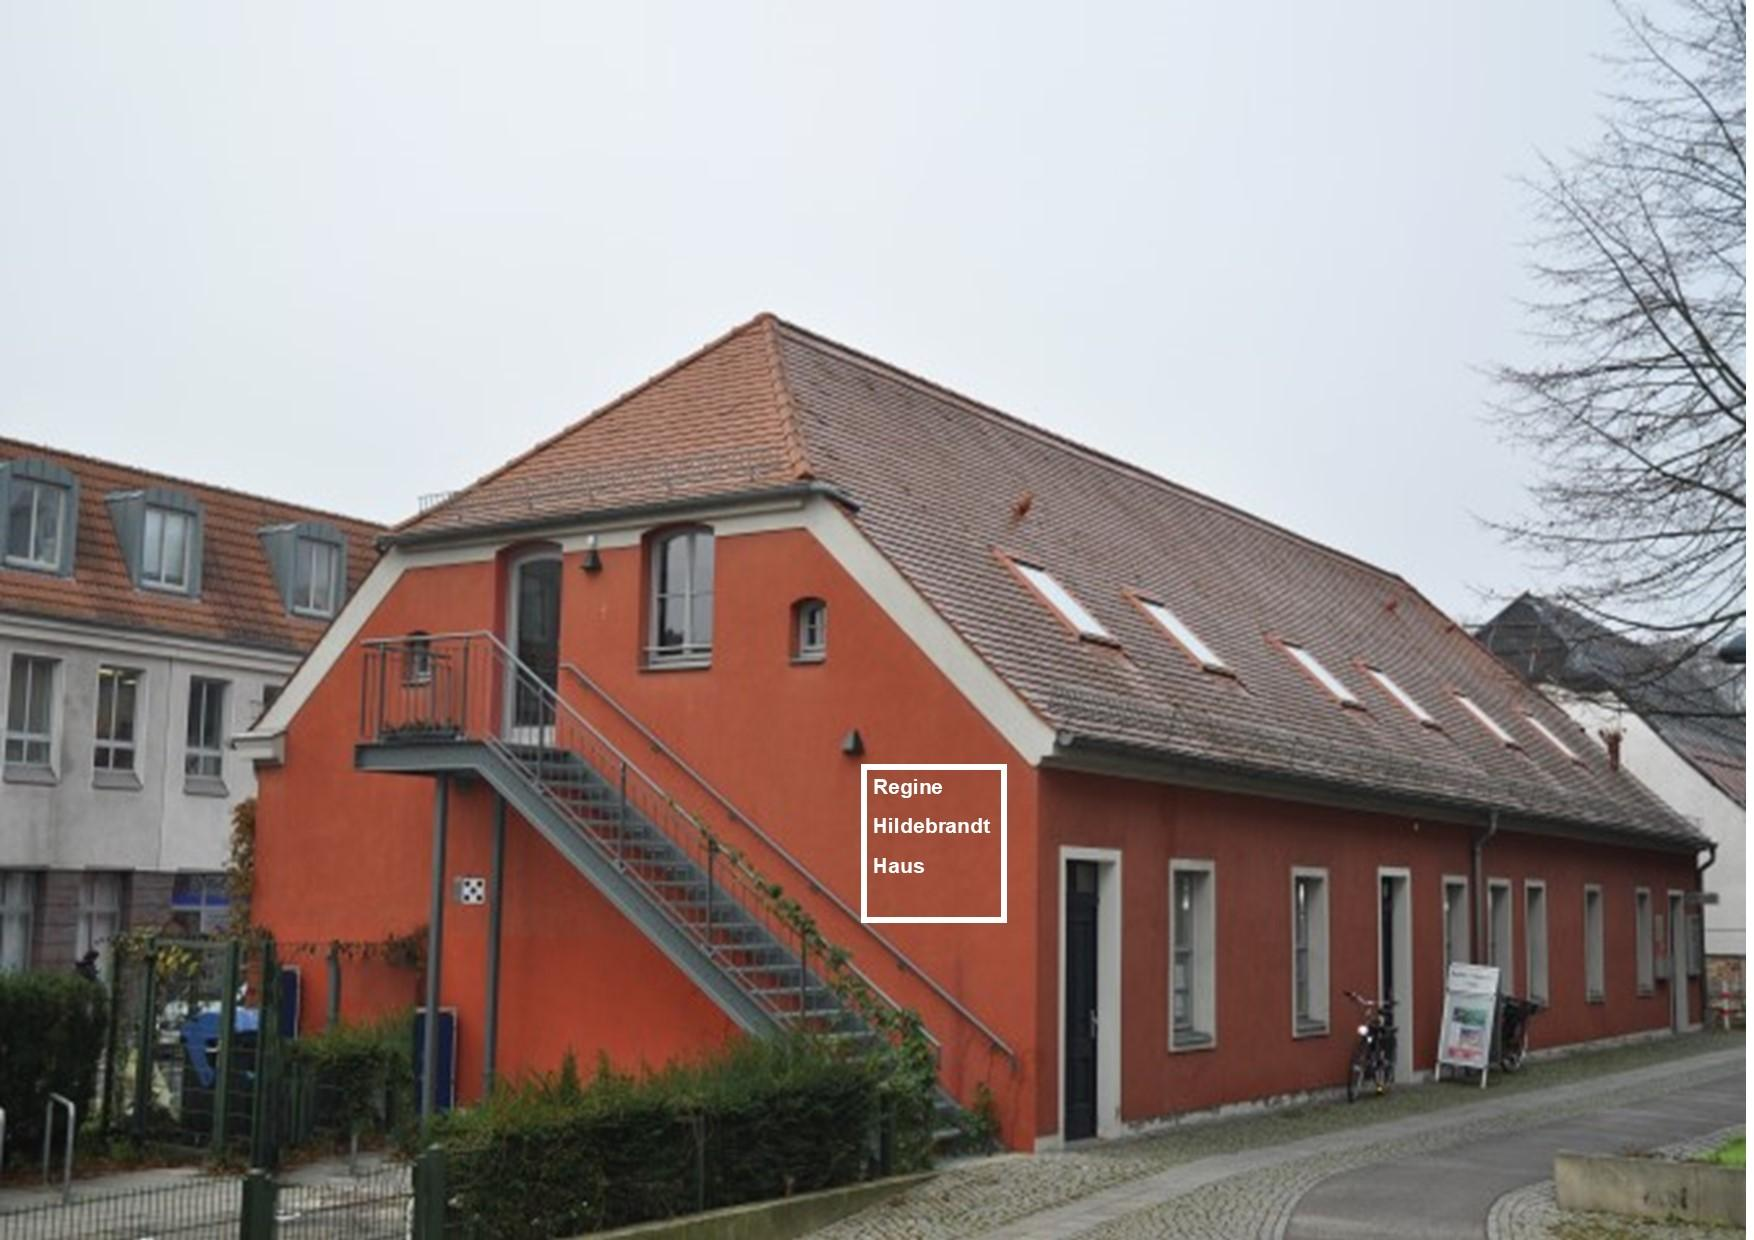 Regine Hildebrandt Haus in Oranienburg